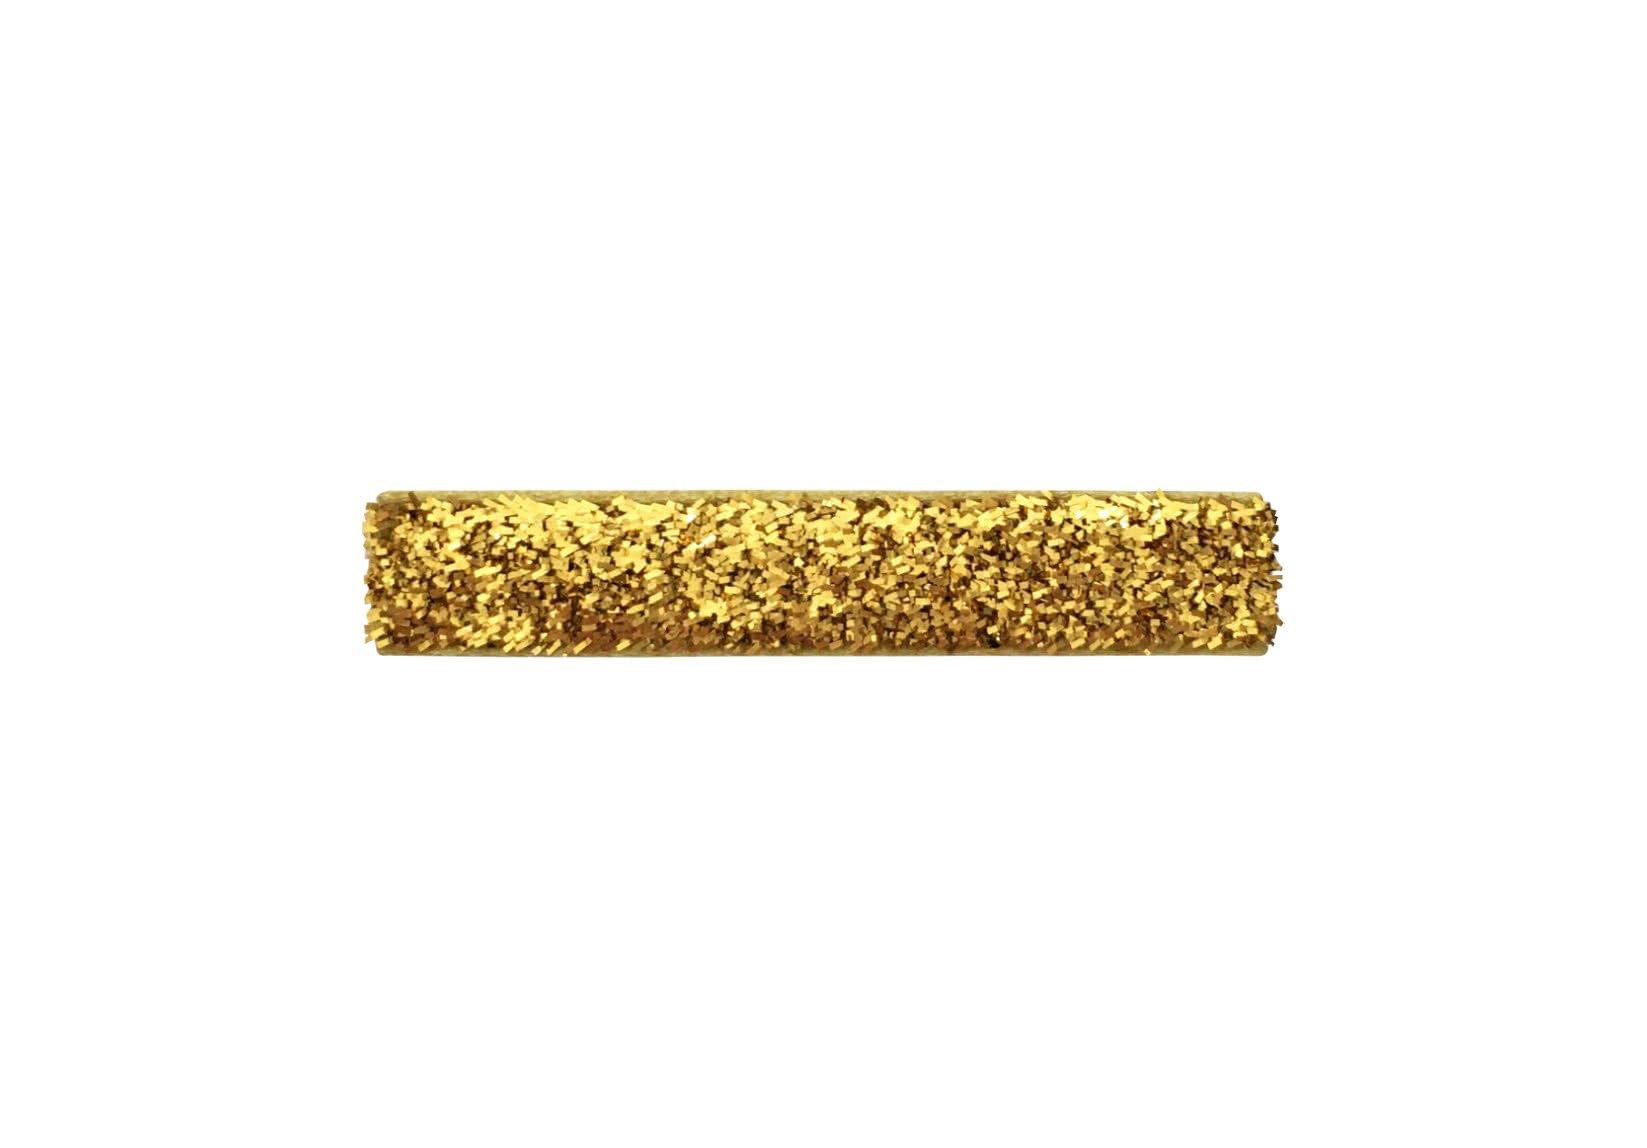 Medium Gold Glitter Covered Alligator Clip – Gold Glitter Collection